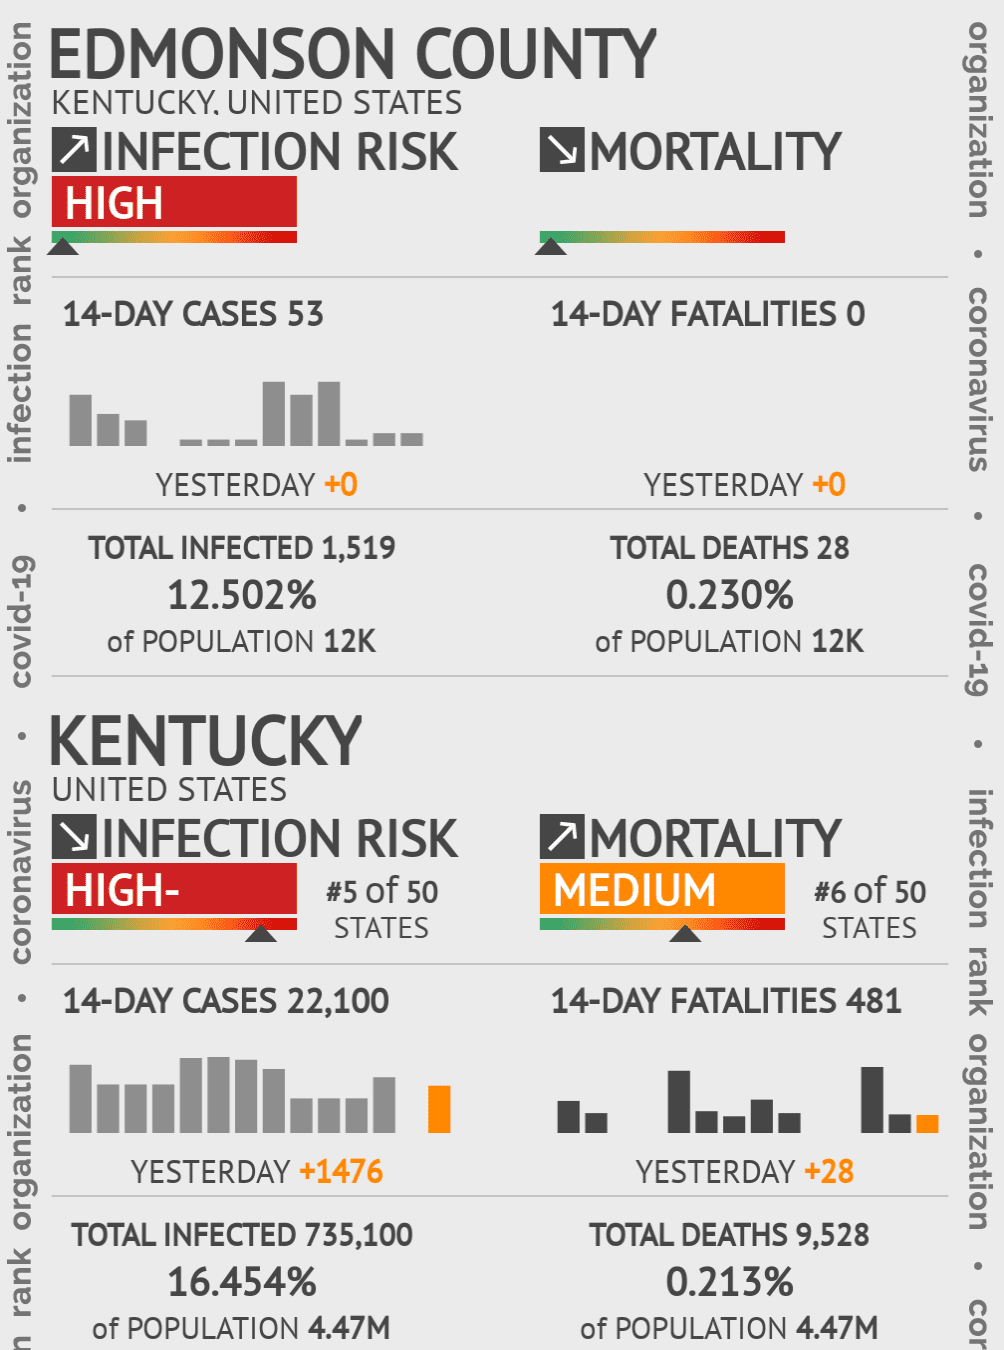 Edmonson County Coronavirus Covid-19 Risk of Infection on March 07, 2021